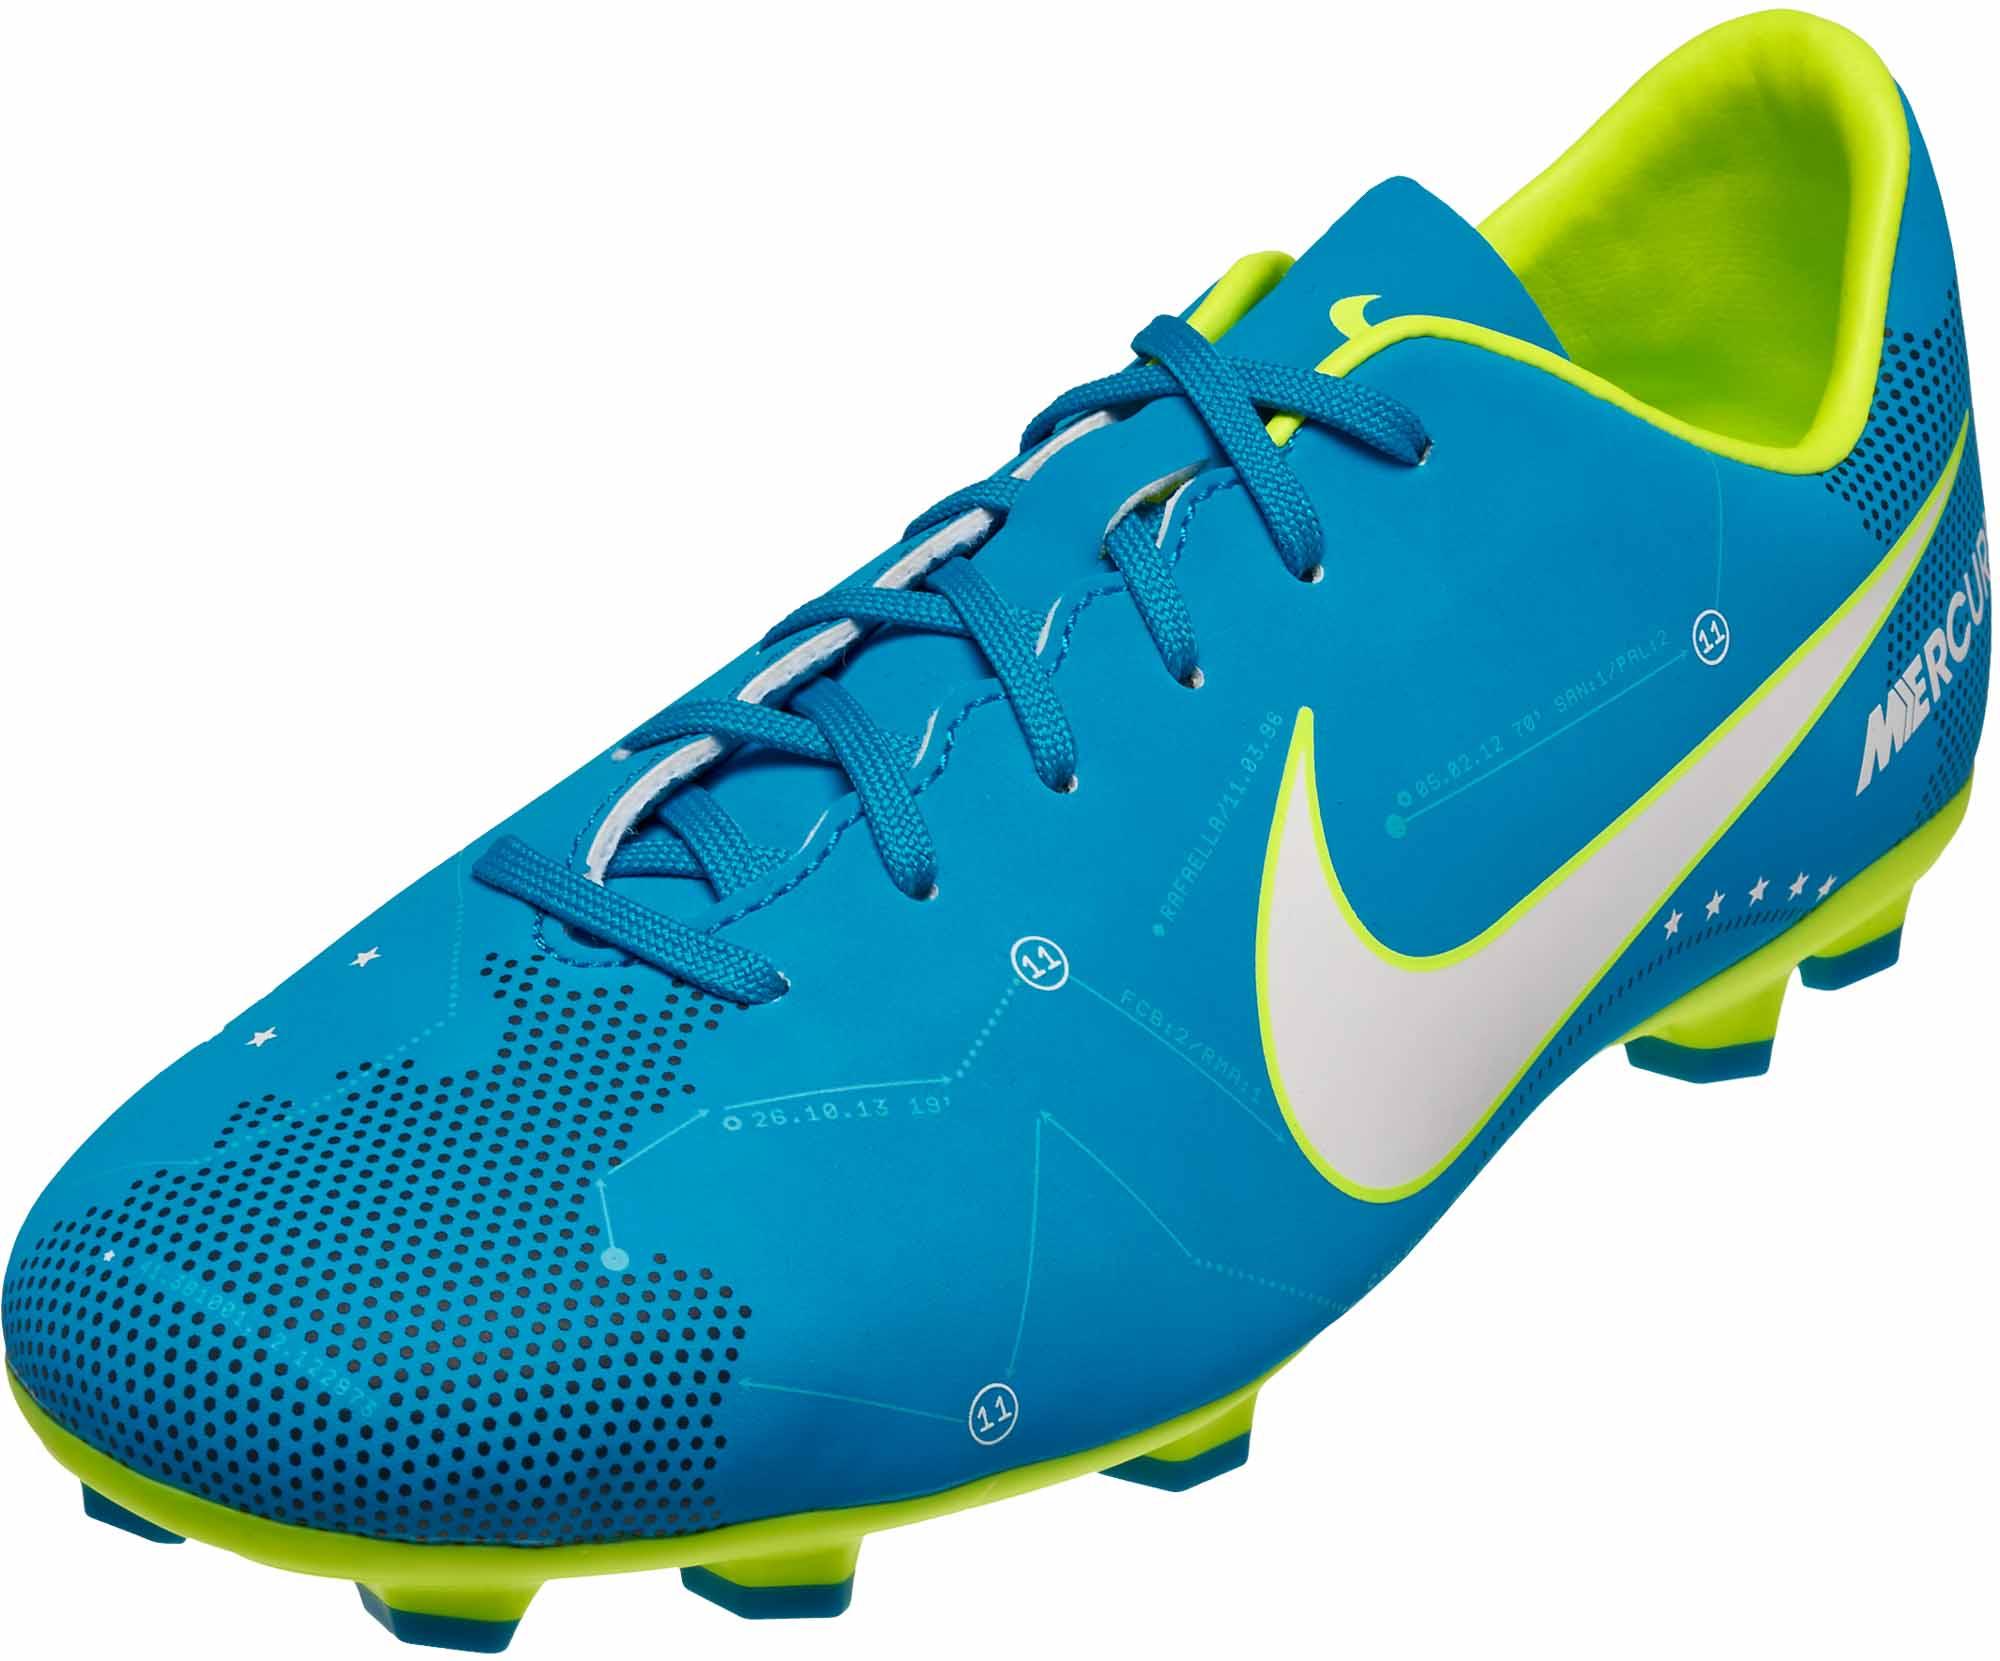 fd3b331eb45 Nike Kids Mercurial Victory VI FG Soccer Cleats – Neymar – Blue Orbit    White